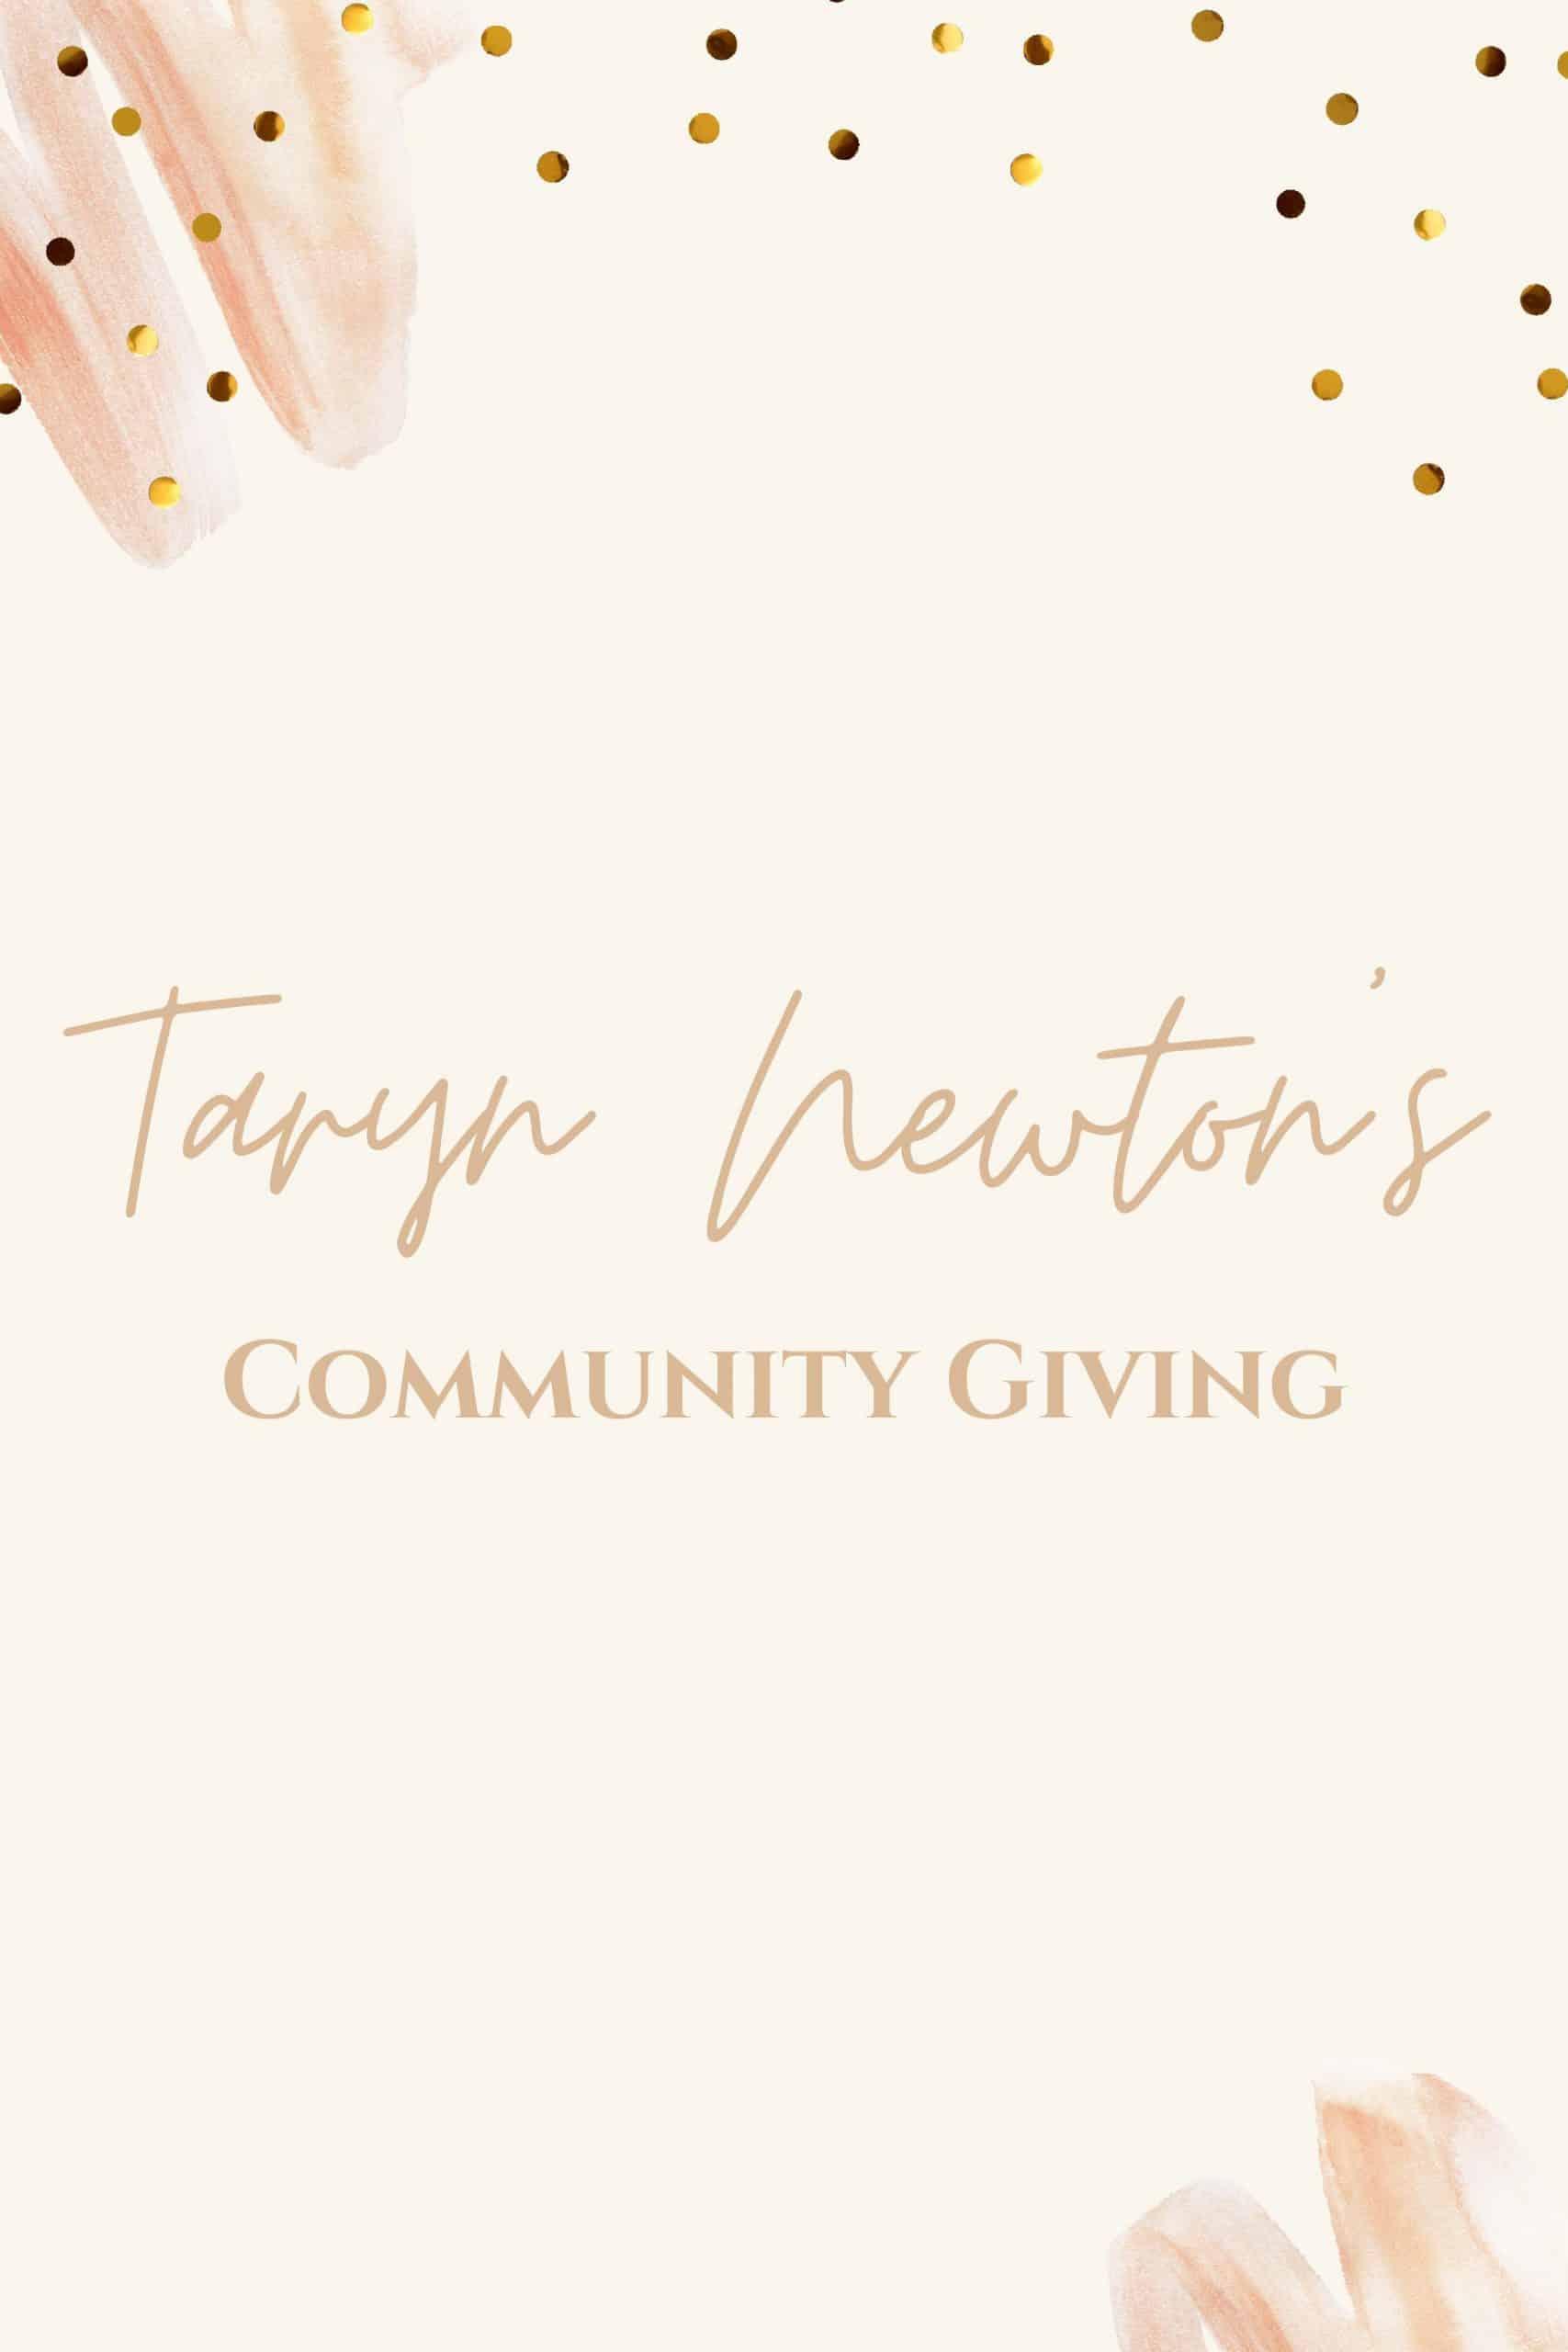 Community Giving by popular Dallas lifestyle blog, Glamorous Versatility: {Pinterest image of Taryn Newton's Community Giving.